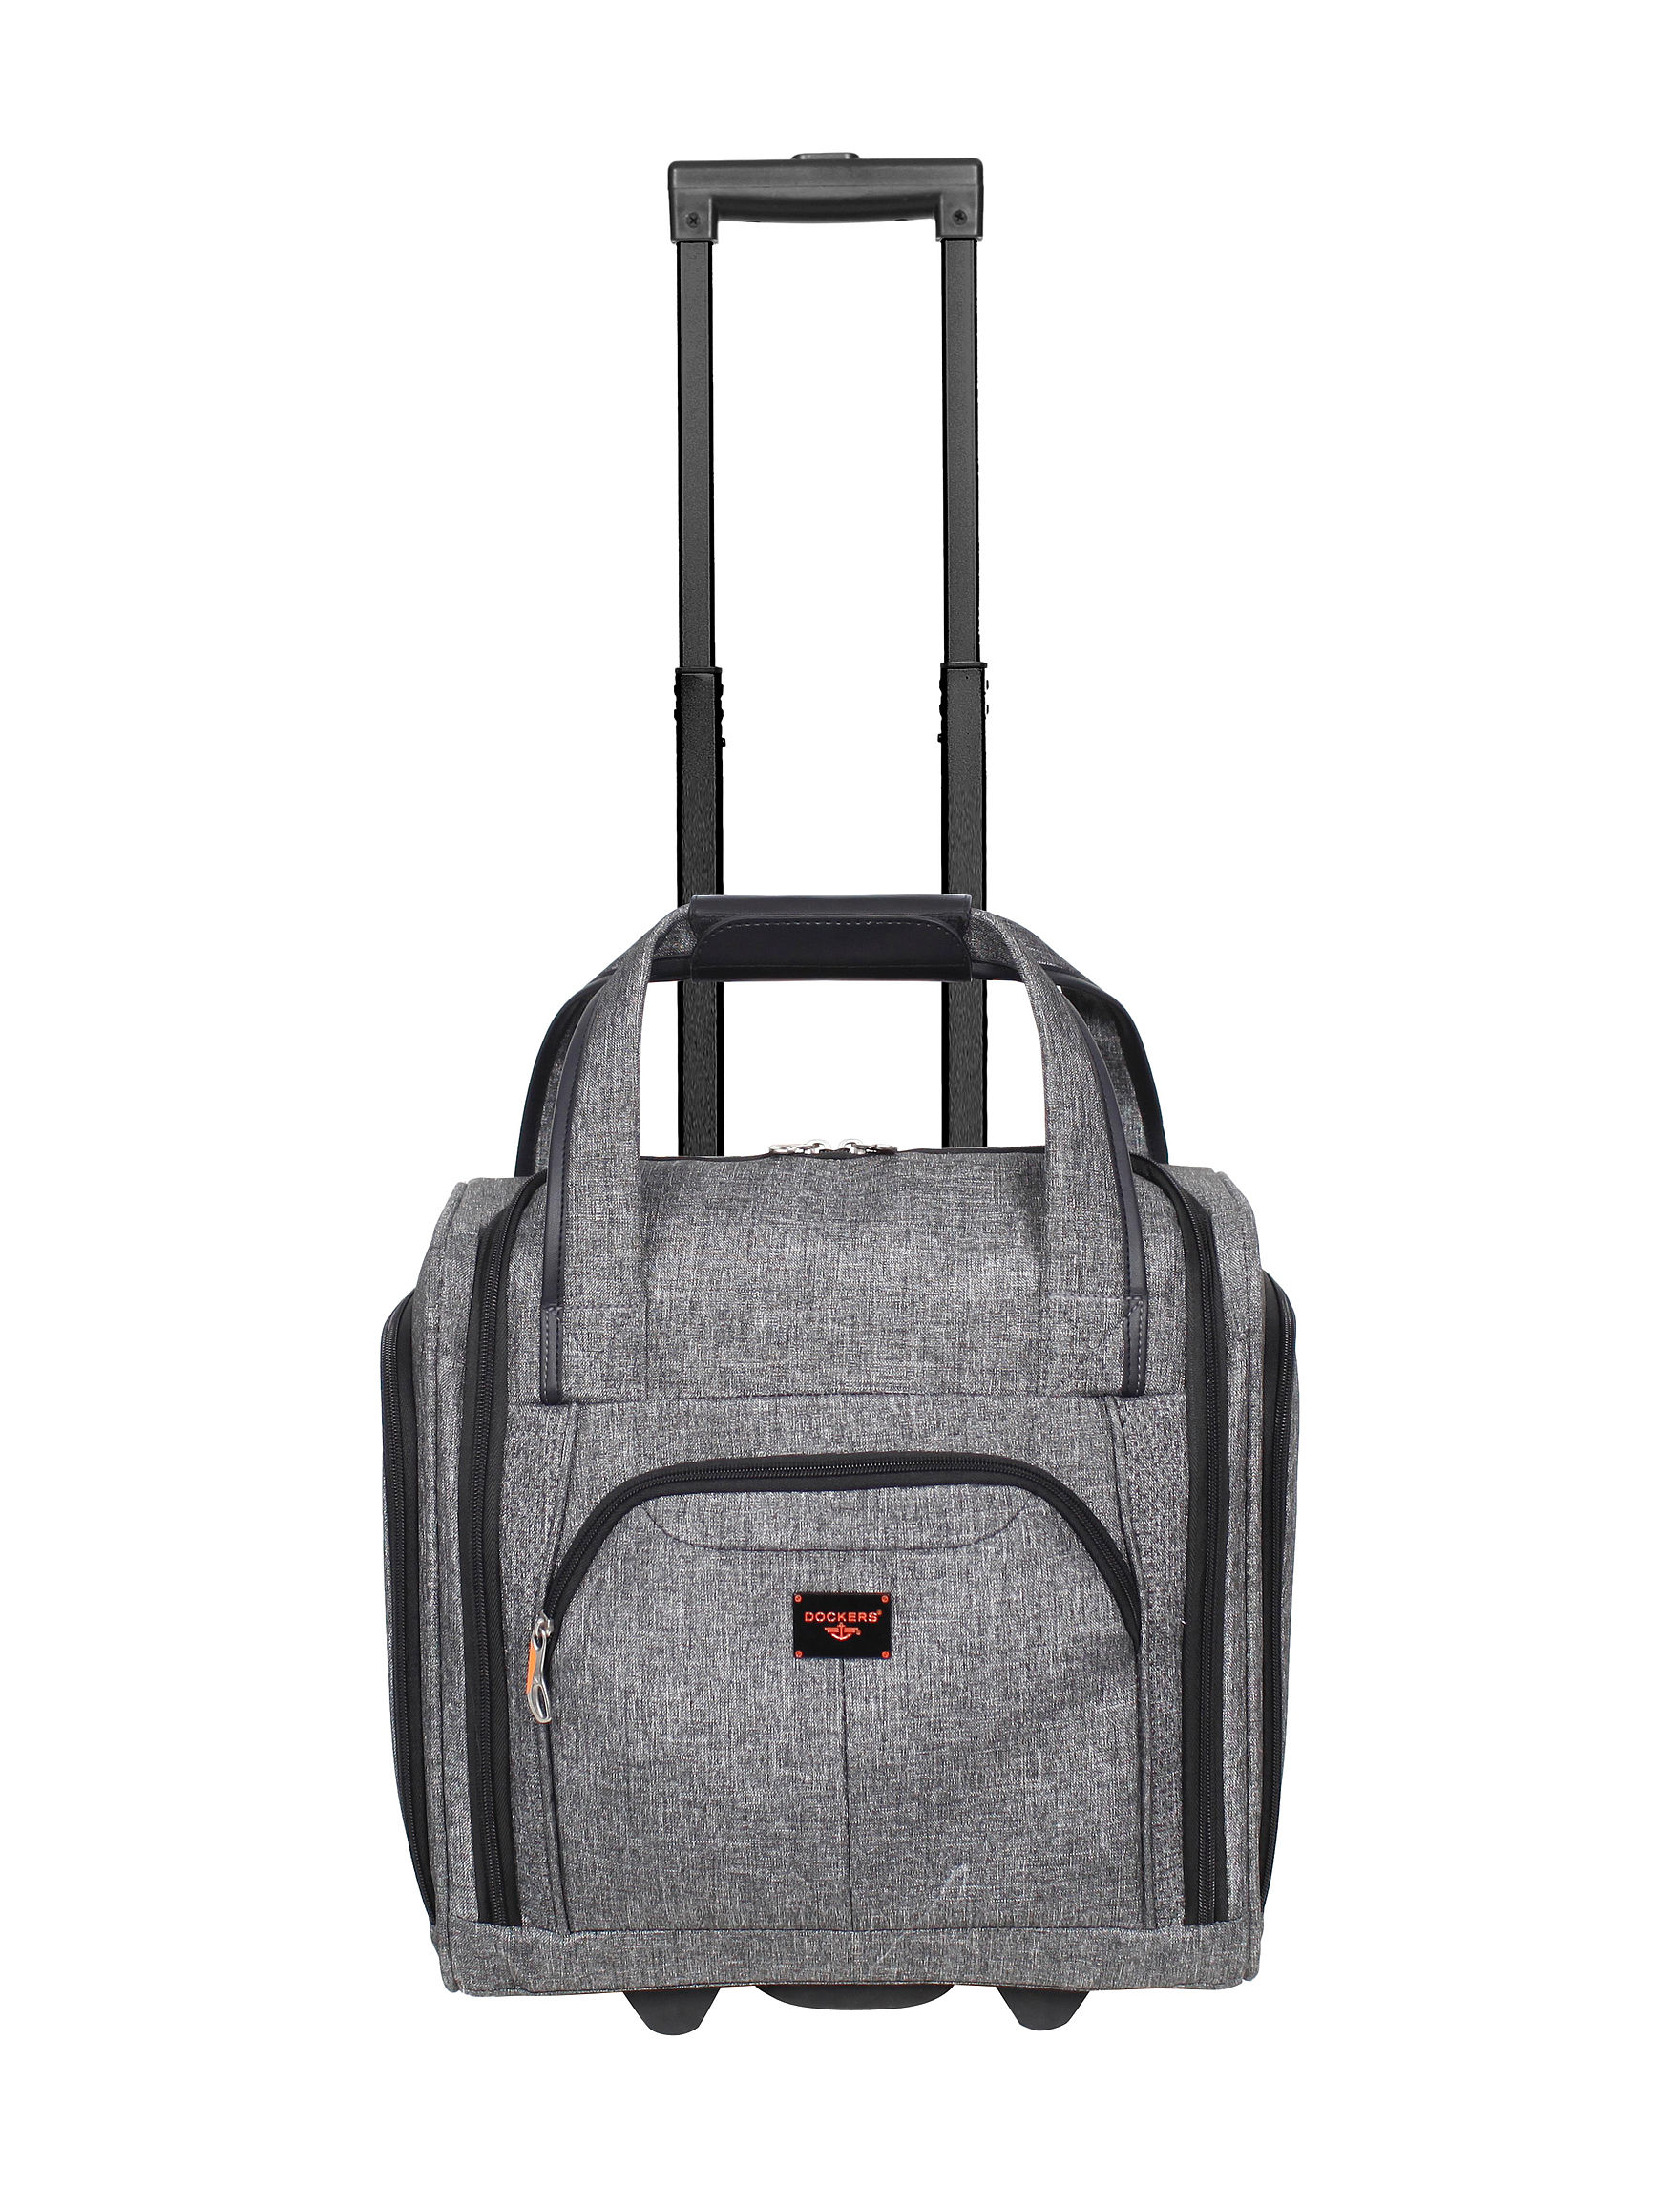 Dockers Charcoal Weekend Bags